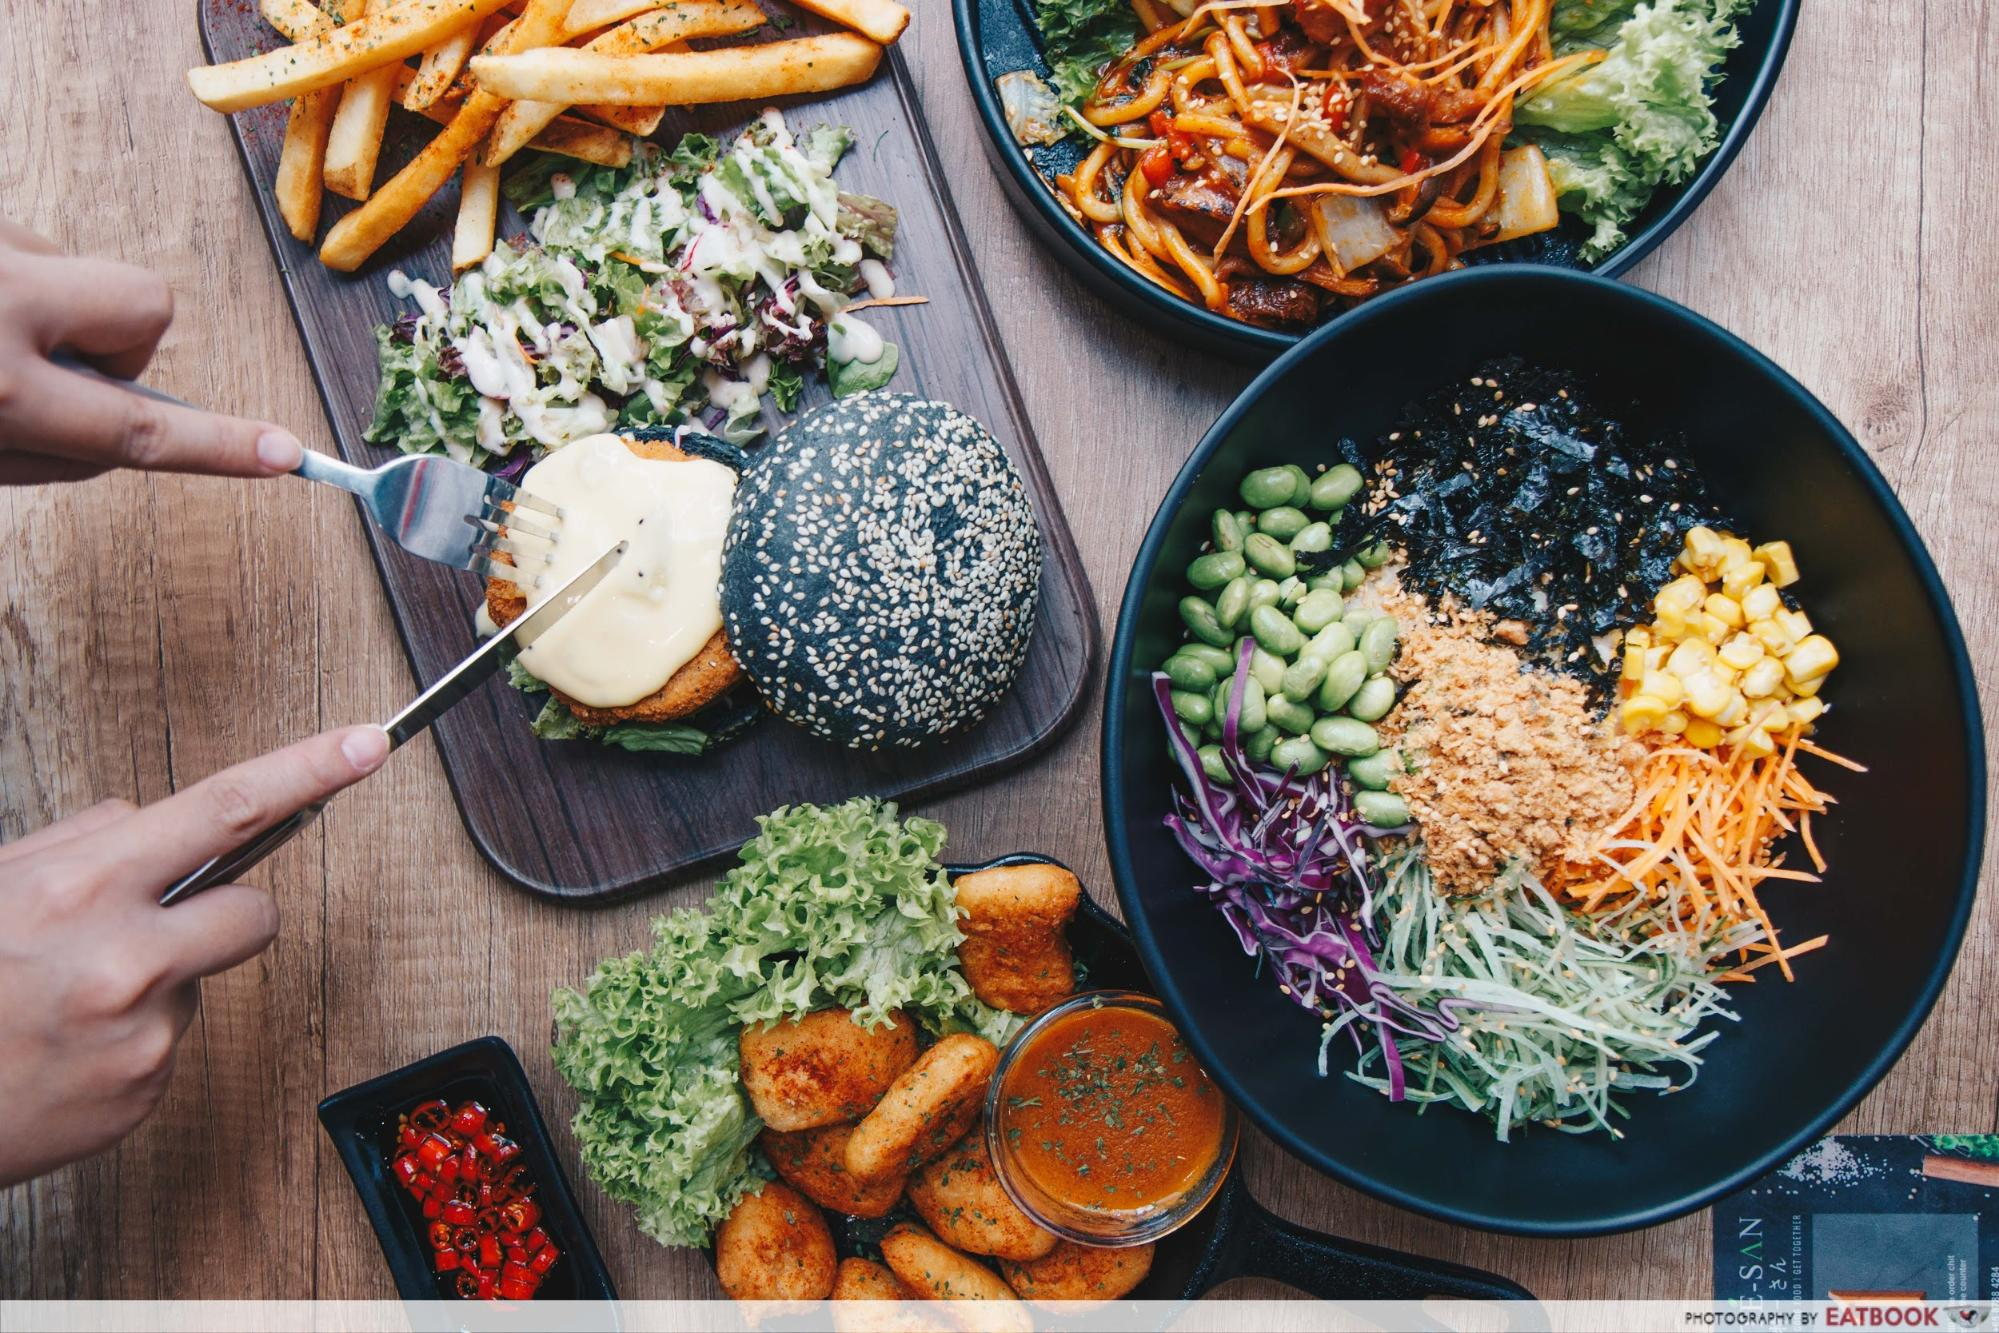 New Restaurant City Square Mall - Saute-San Food